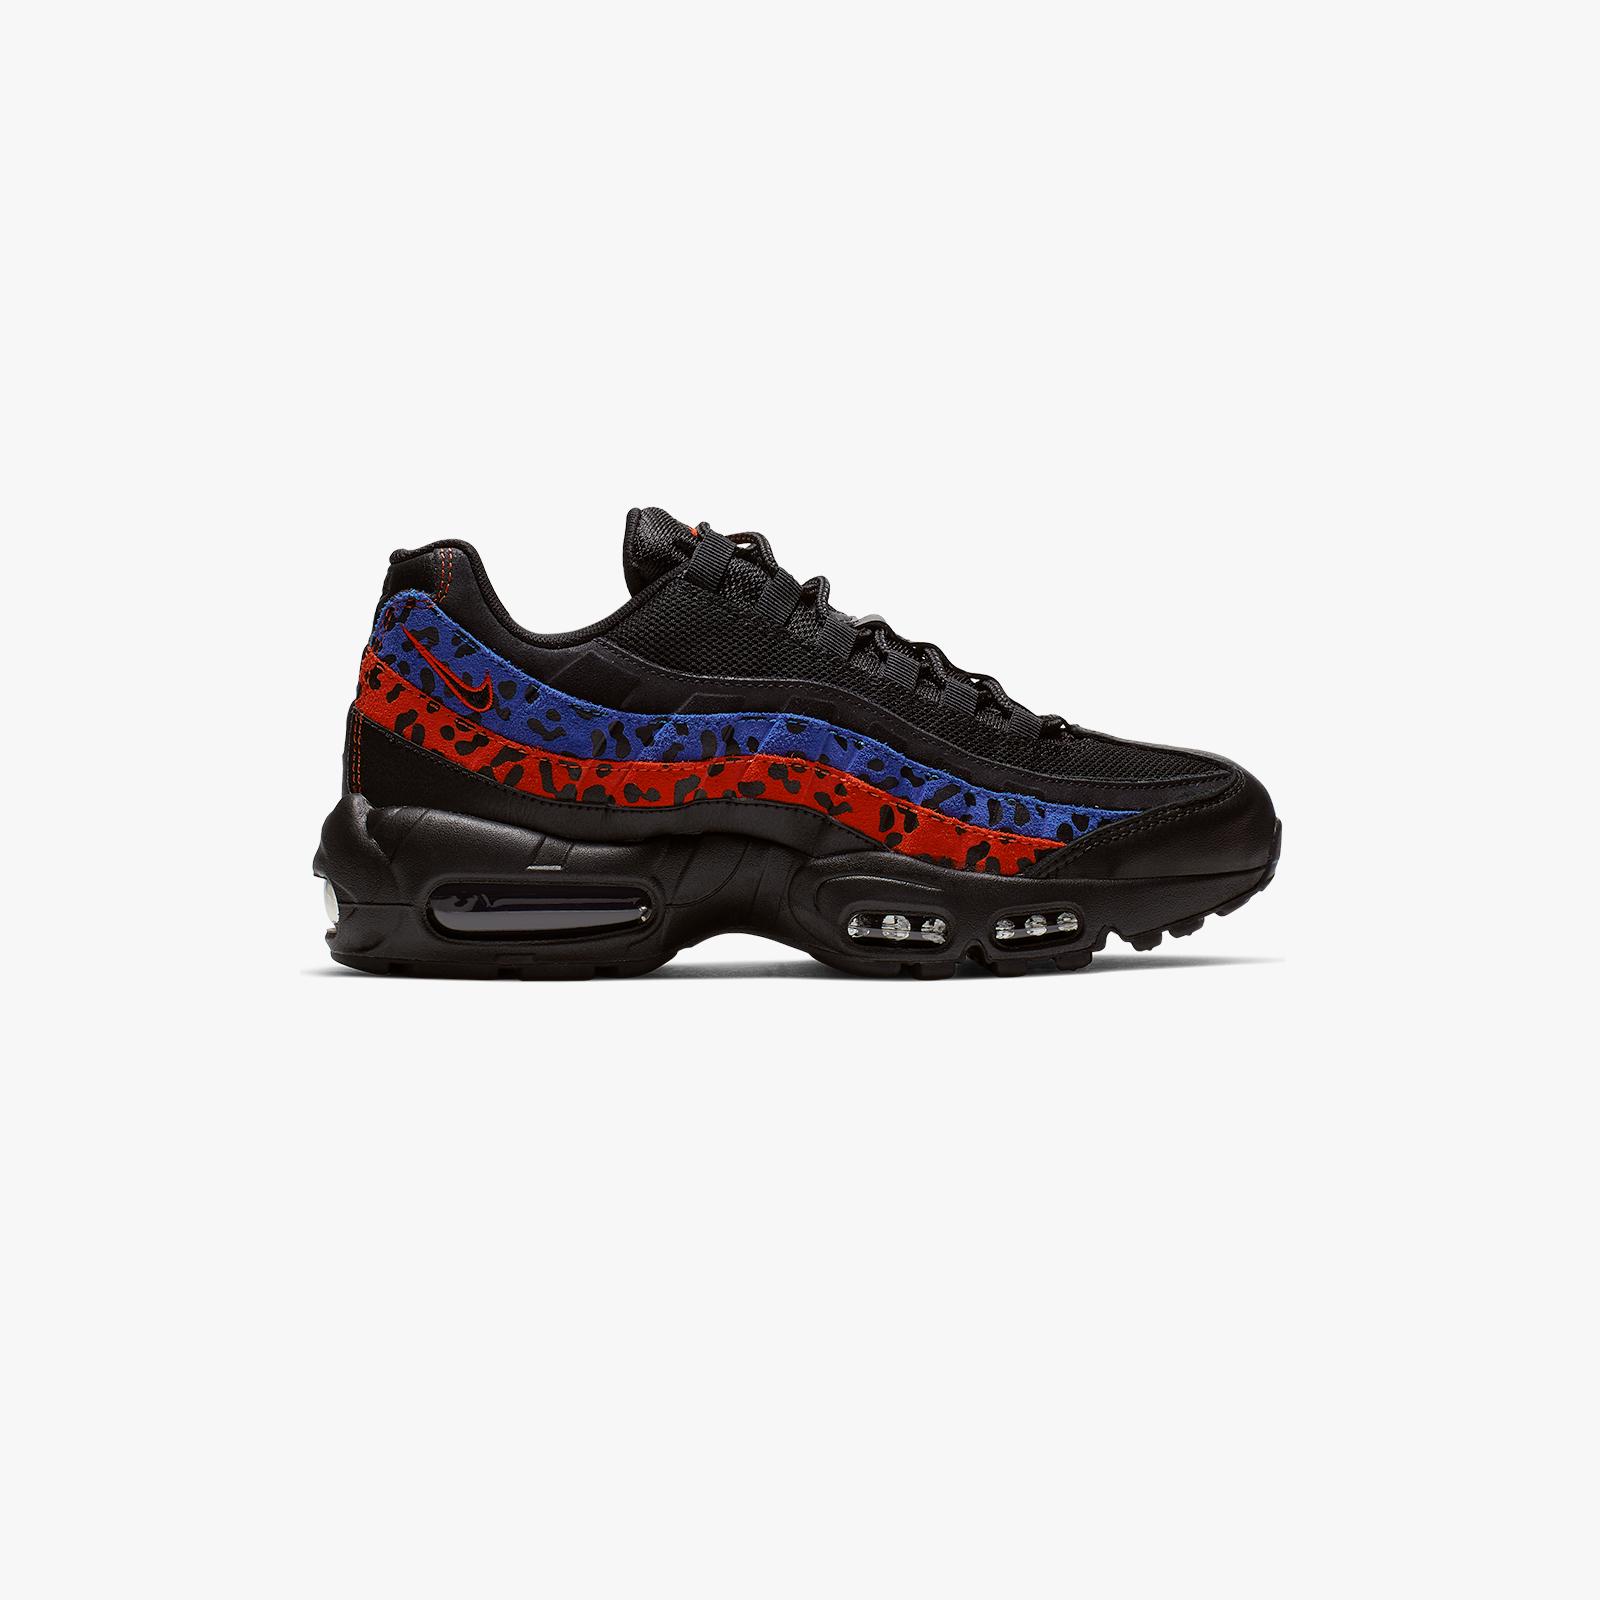 big sale 207c0 a7b47 Nike Sportswear Wmns Air Max 95 Premium